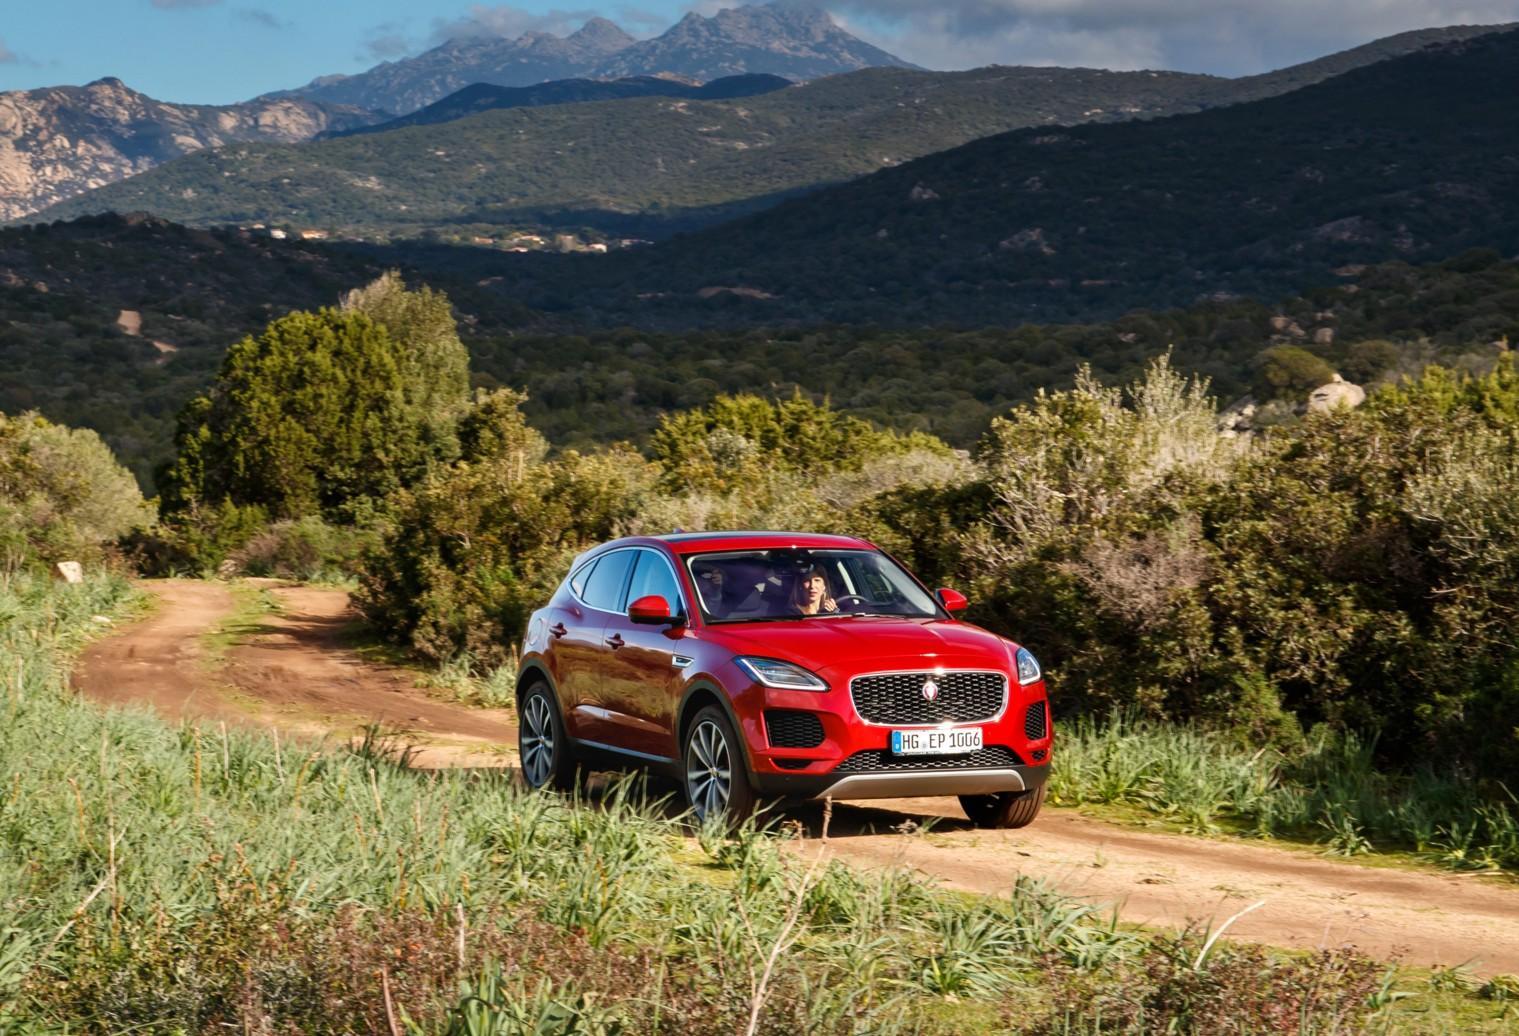 Jaguar E-Pace in Corsica